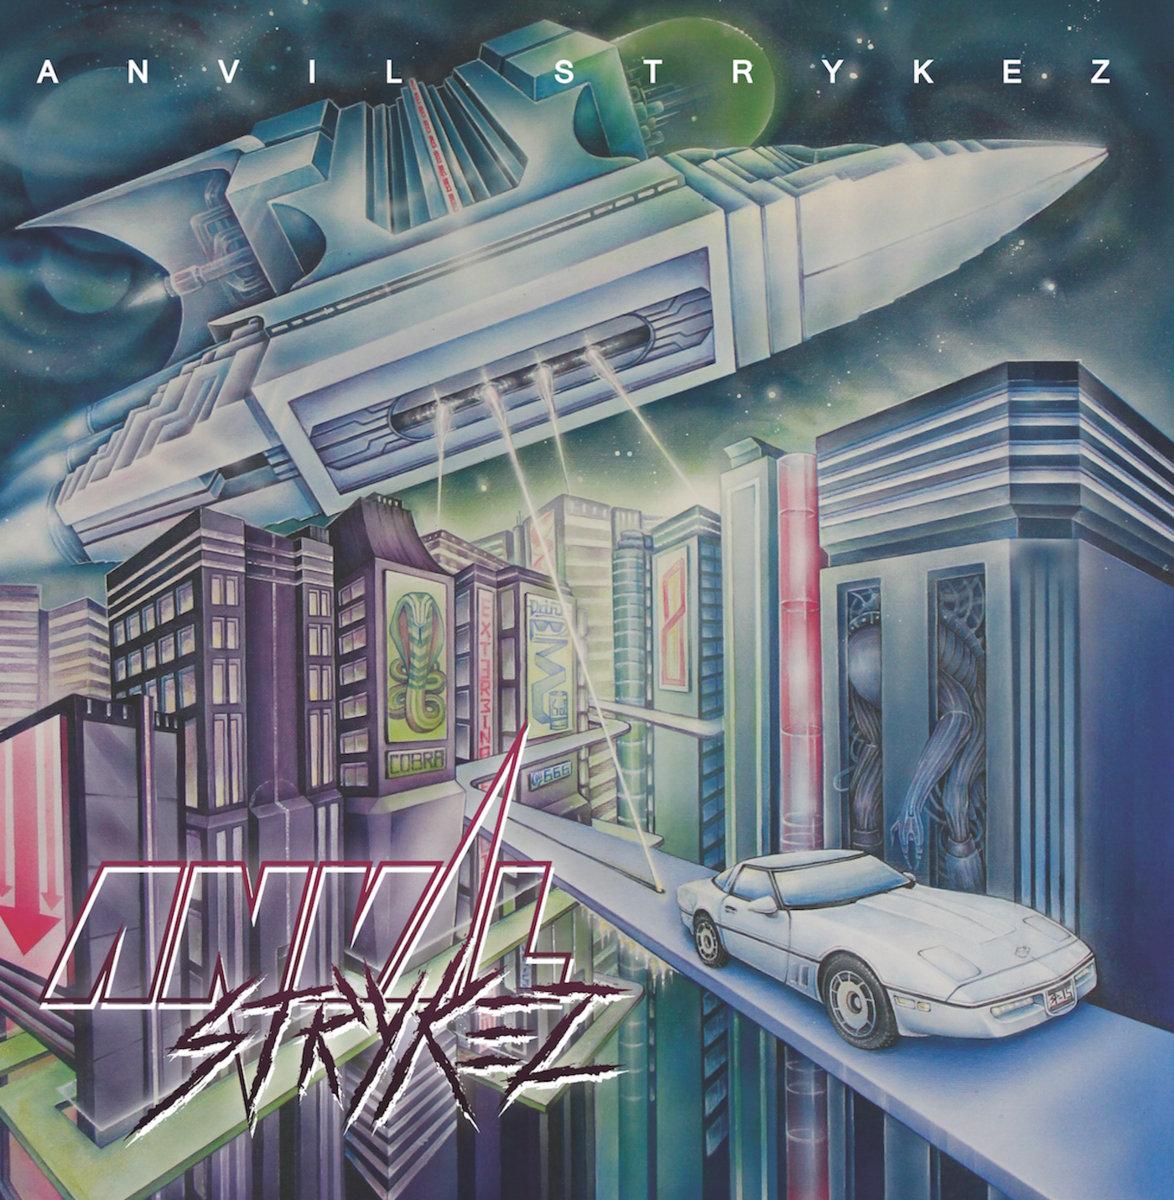 ANVIL STRYKEZ - Anvil Strykez (CD)